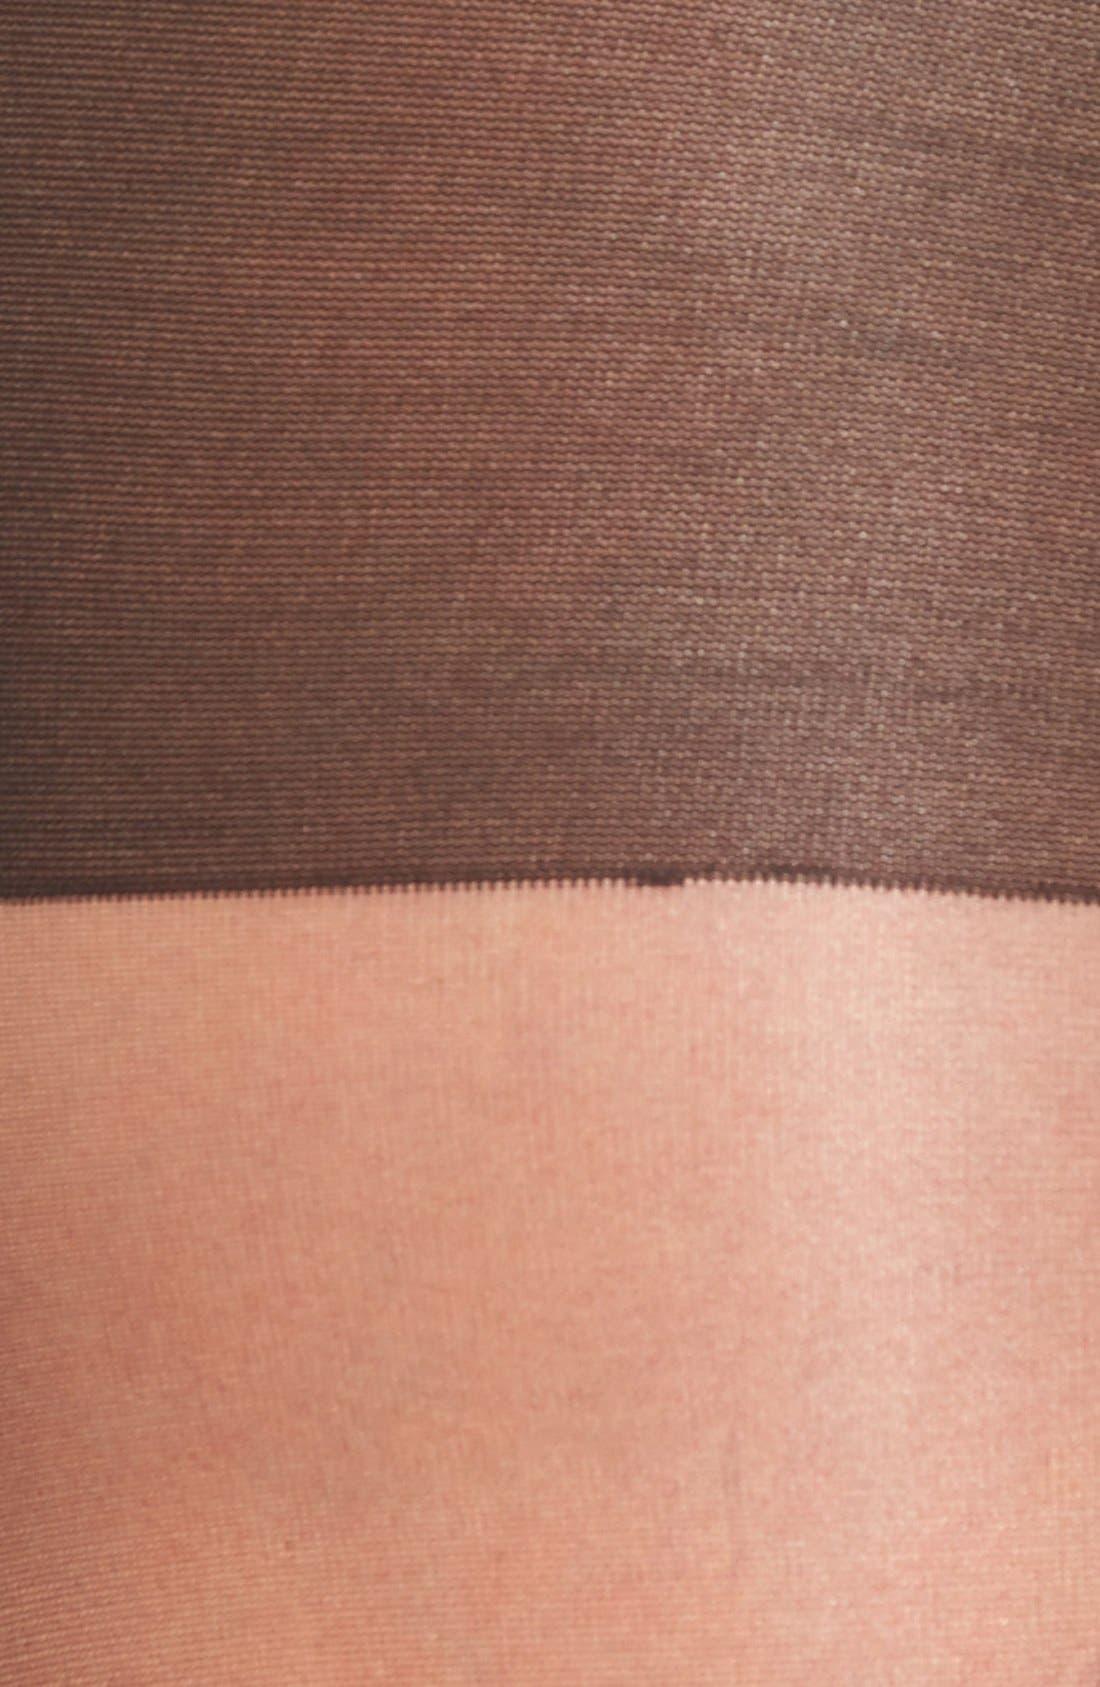 Waist Control Sheer Pantyhose,                             Alternate thumbnail 11, color,